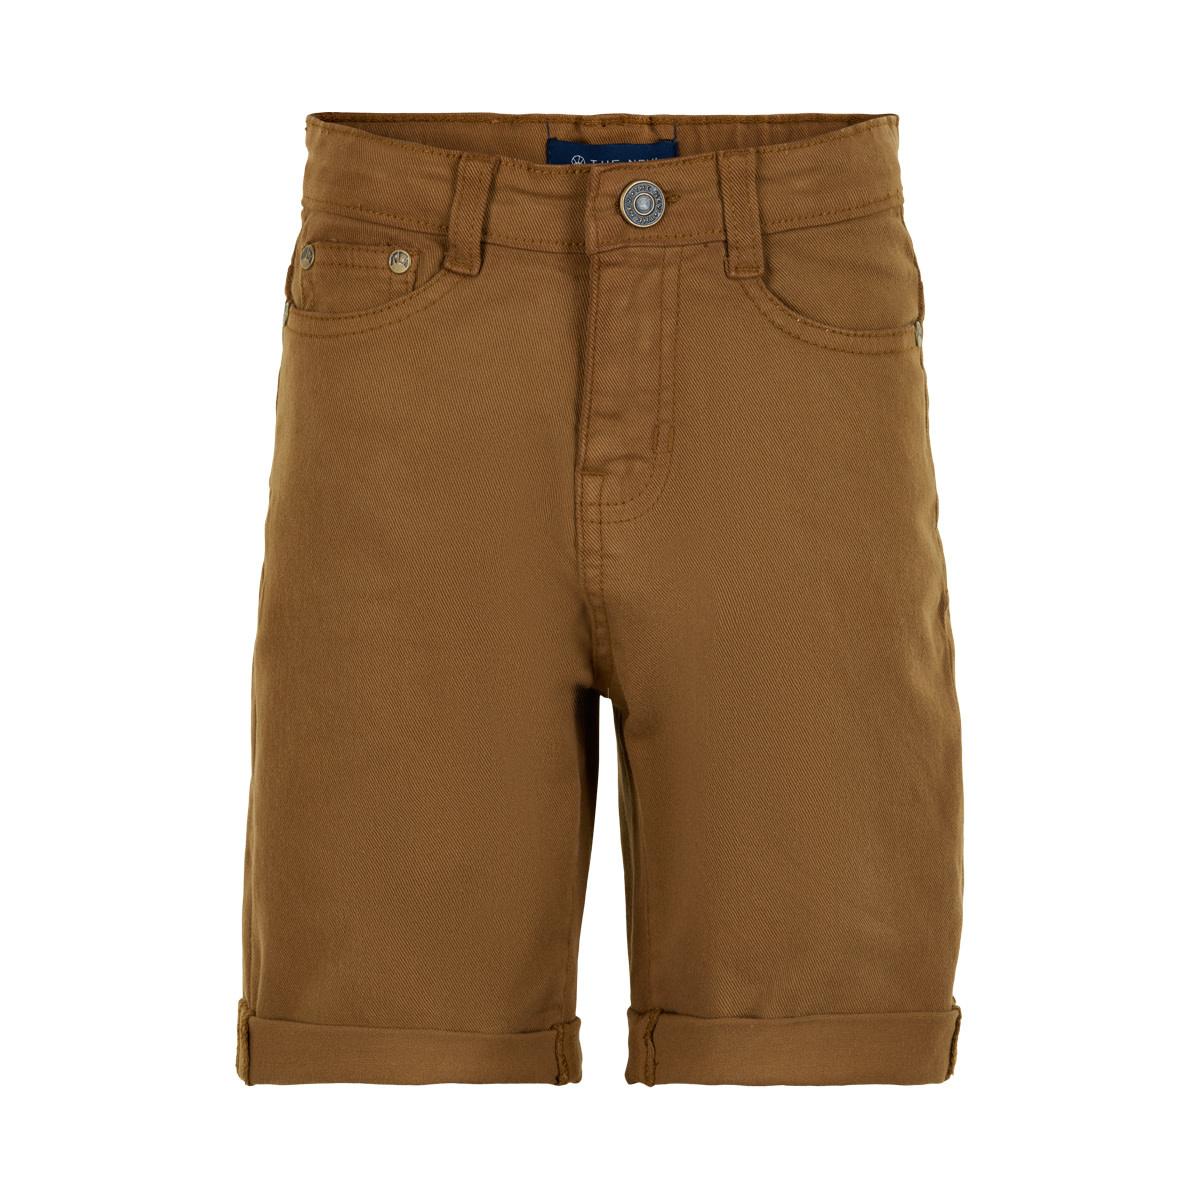 Une Shorts - Camel